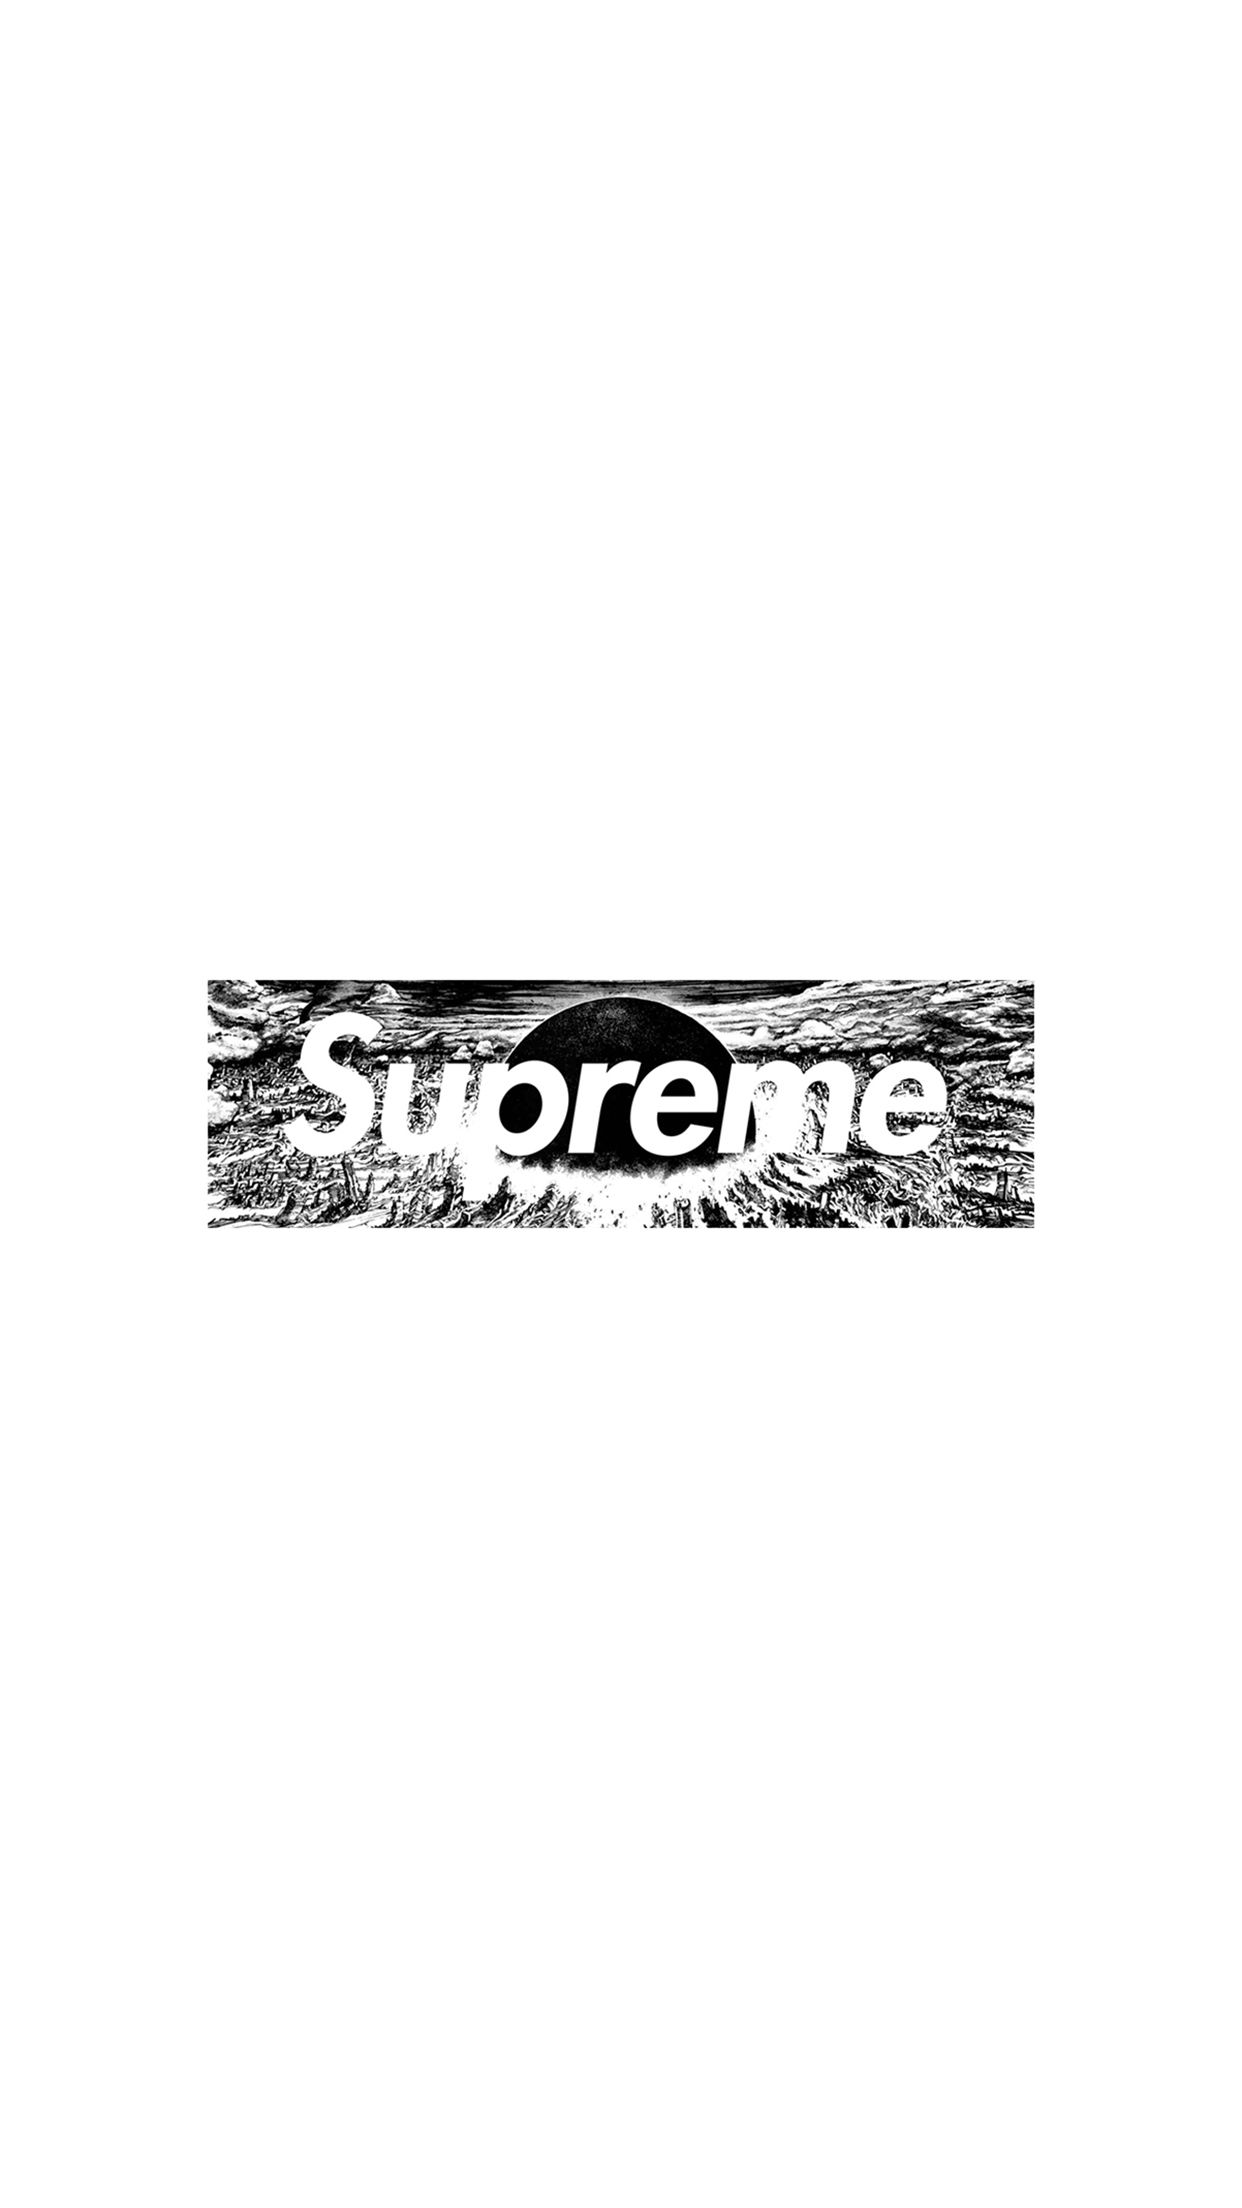 53 White Supreme Iphone Wallpaper On Wallpapersafari